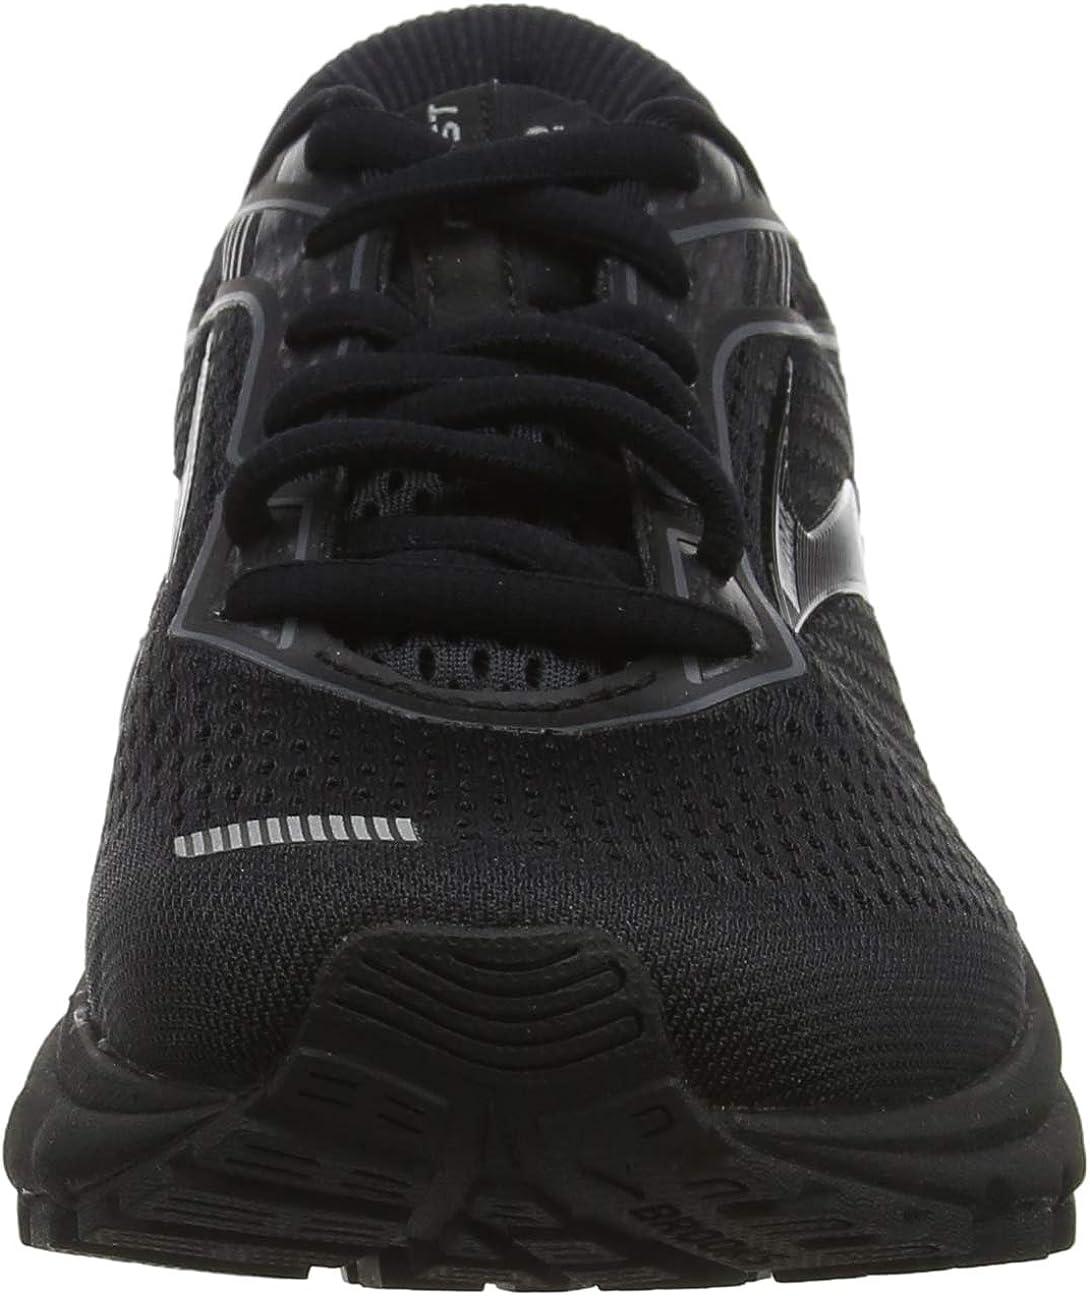 BRK-120305 1B 4356660 7.5 Black//Grey Brooks Womens Ghost 12 Running Shoe 040